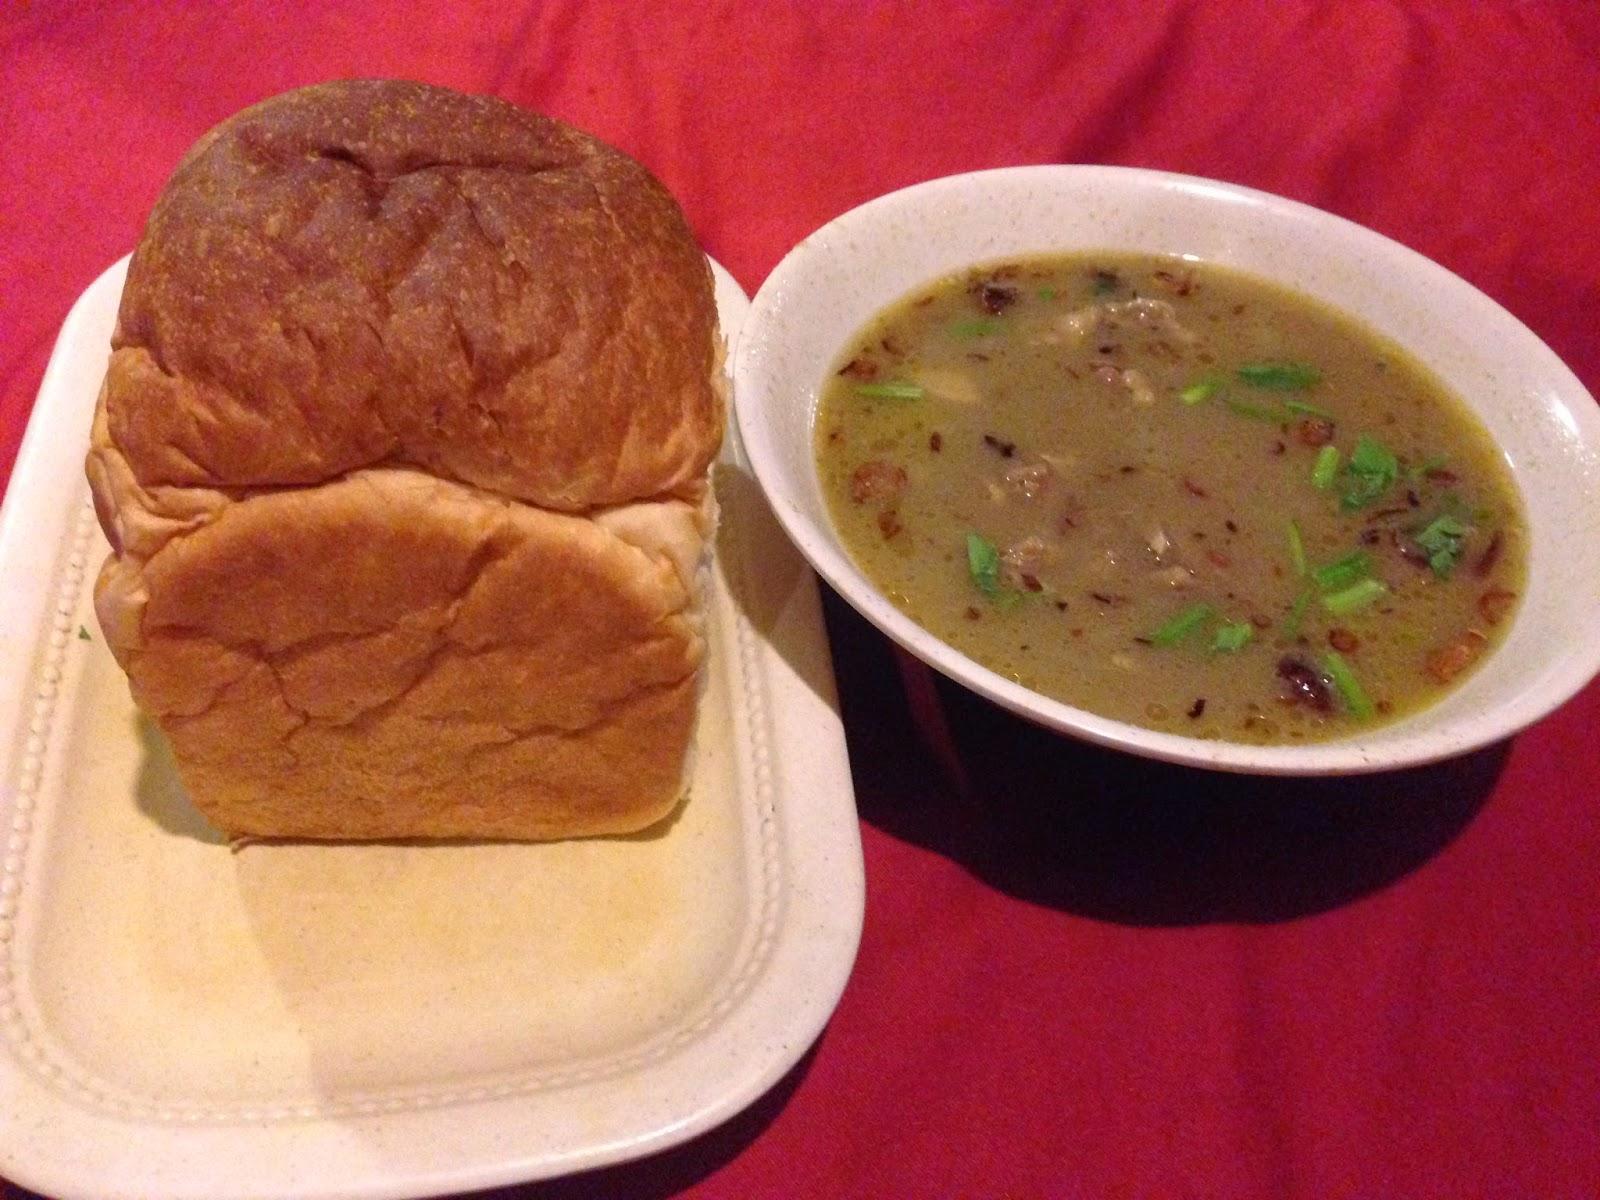 Roti arab & sup kambing at Puncak Mutiara Cafe